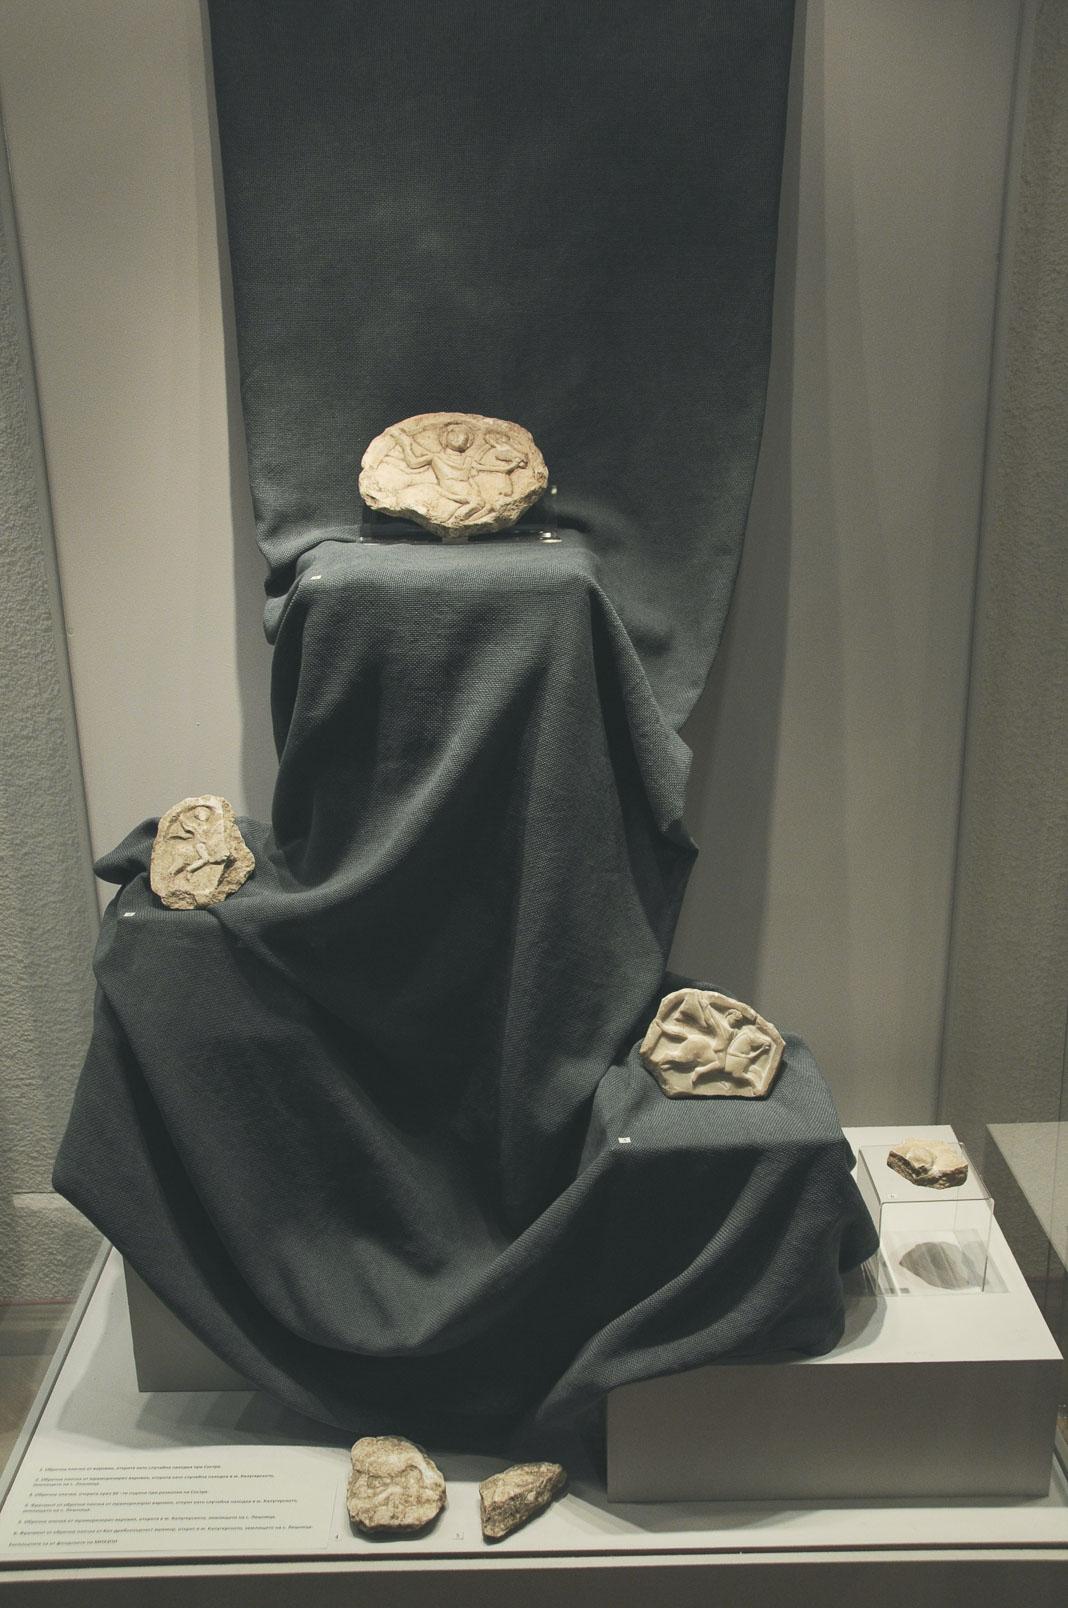 troyan-museum-jivotat-na-edna-idea-5